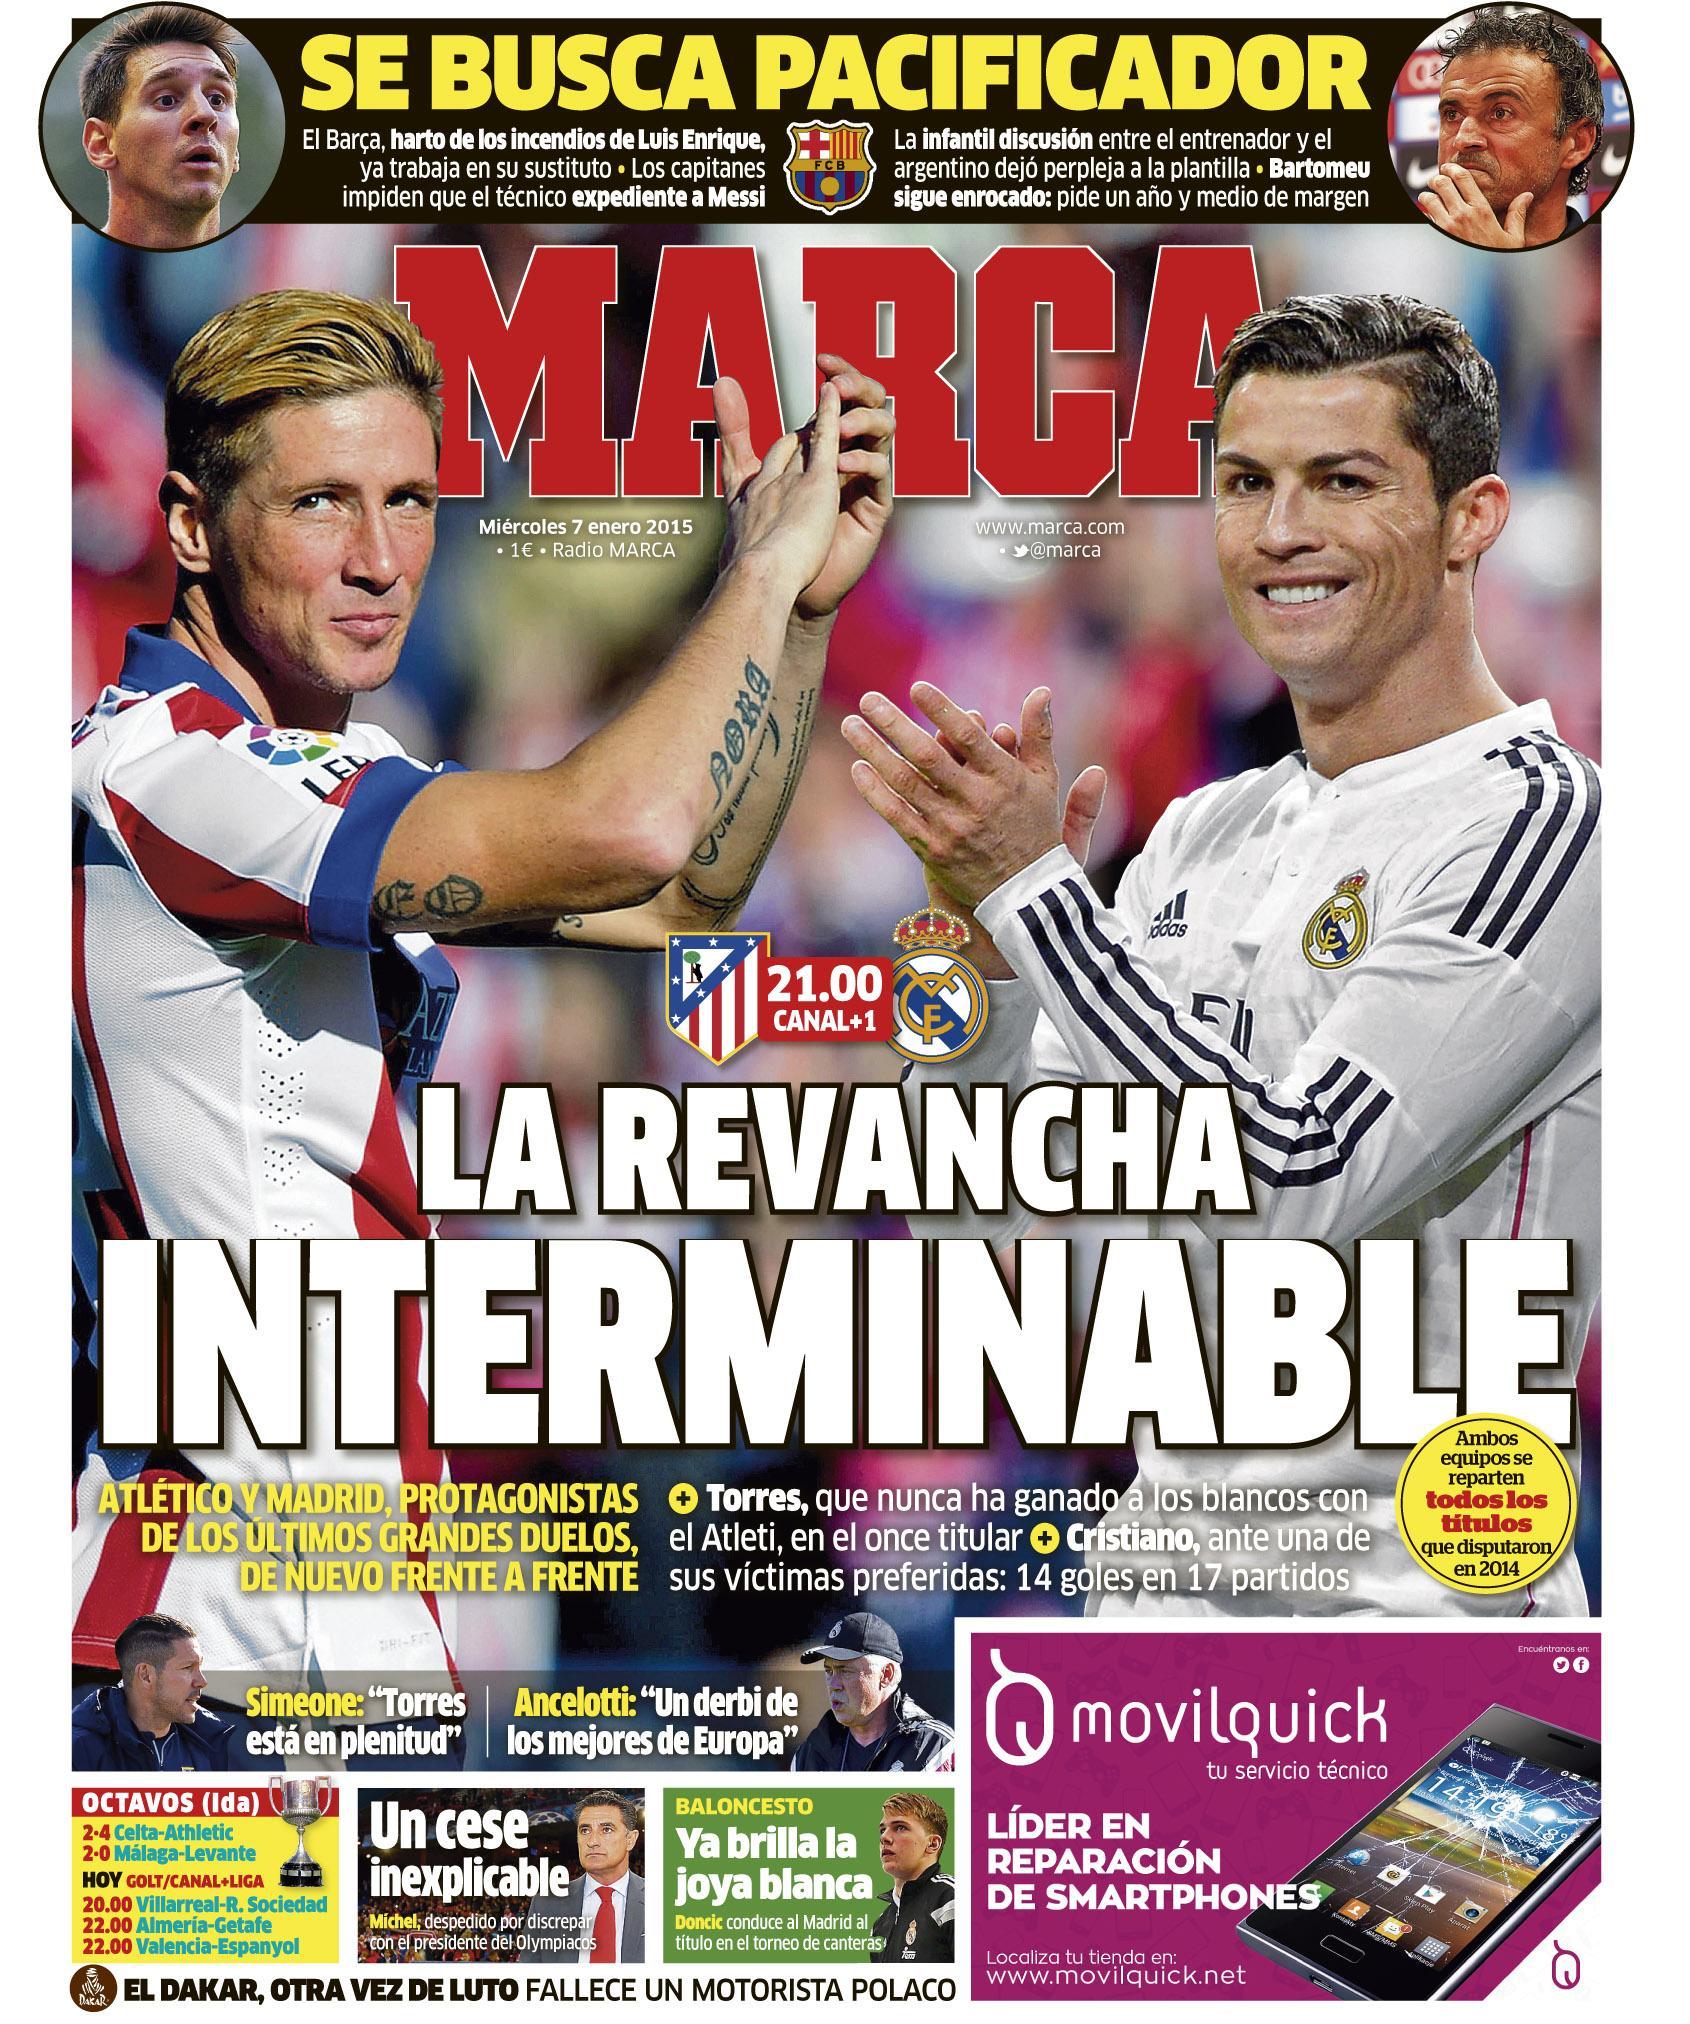 'La revancha interminable' #LaPortada http://t.co/TdslOtJI0k